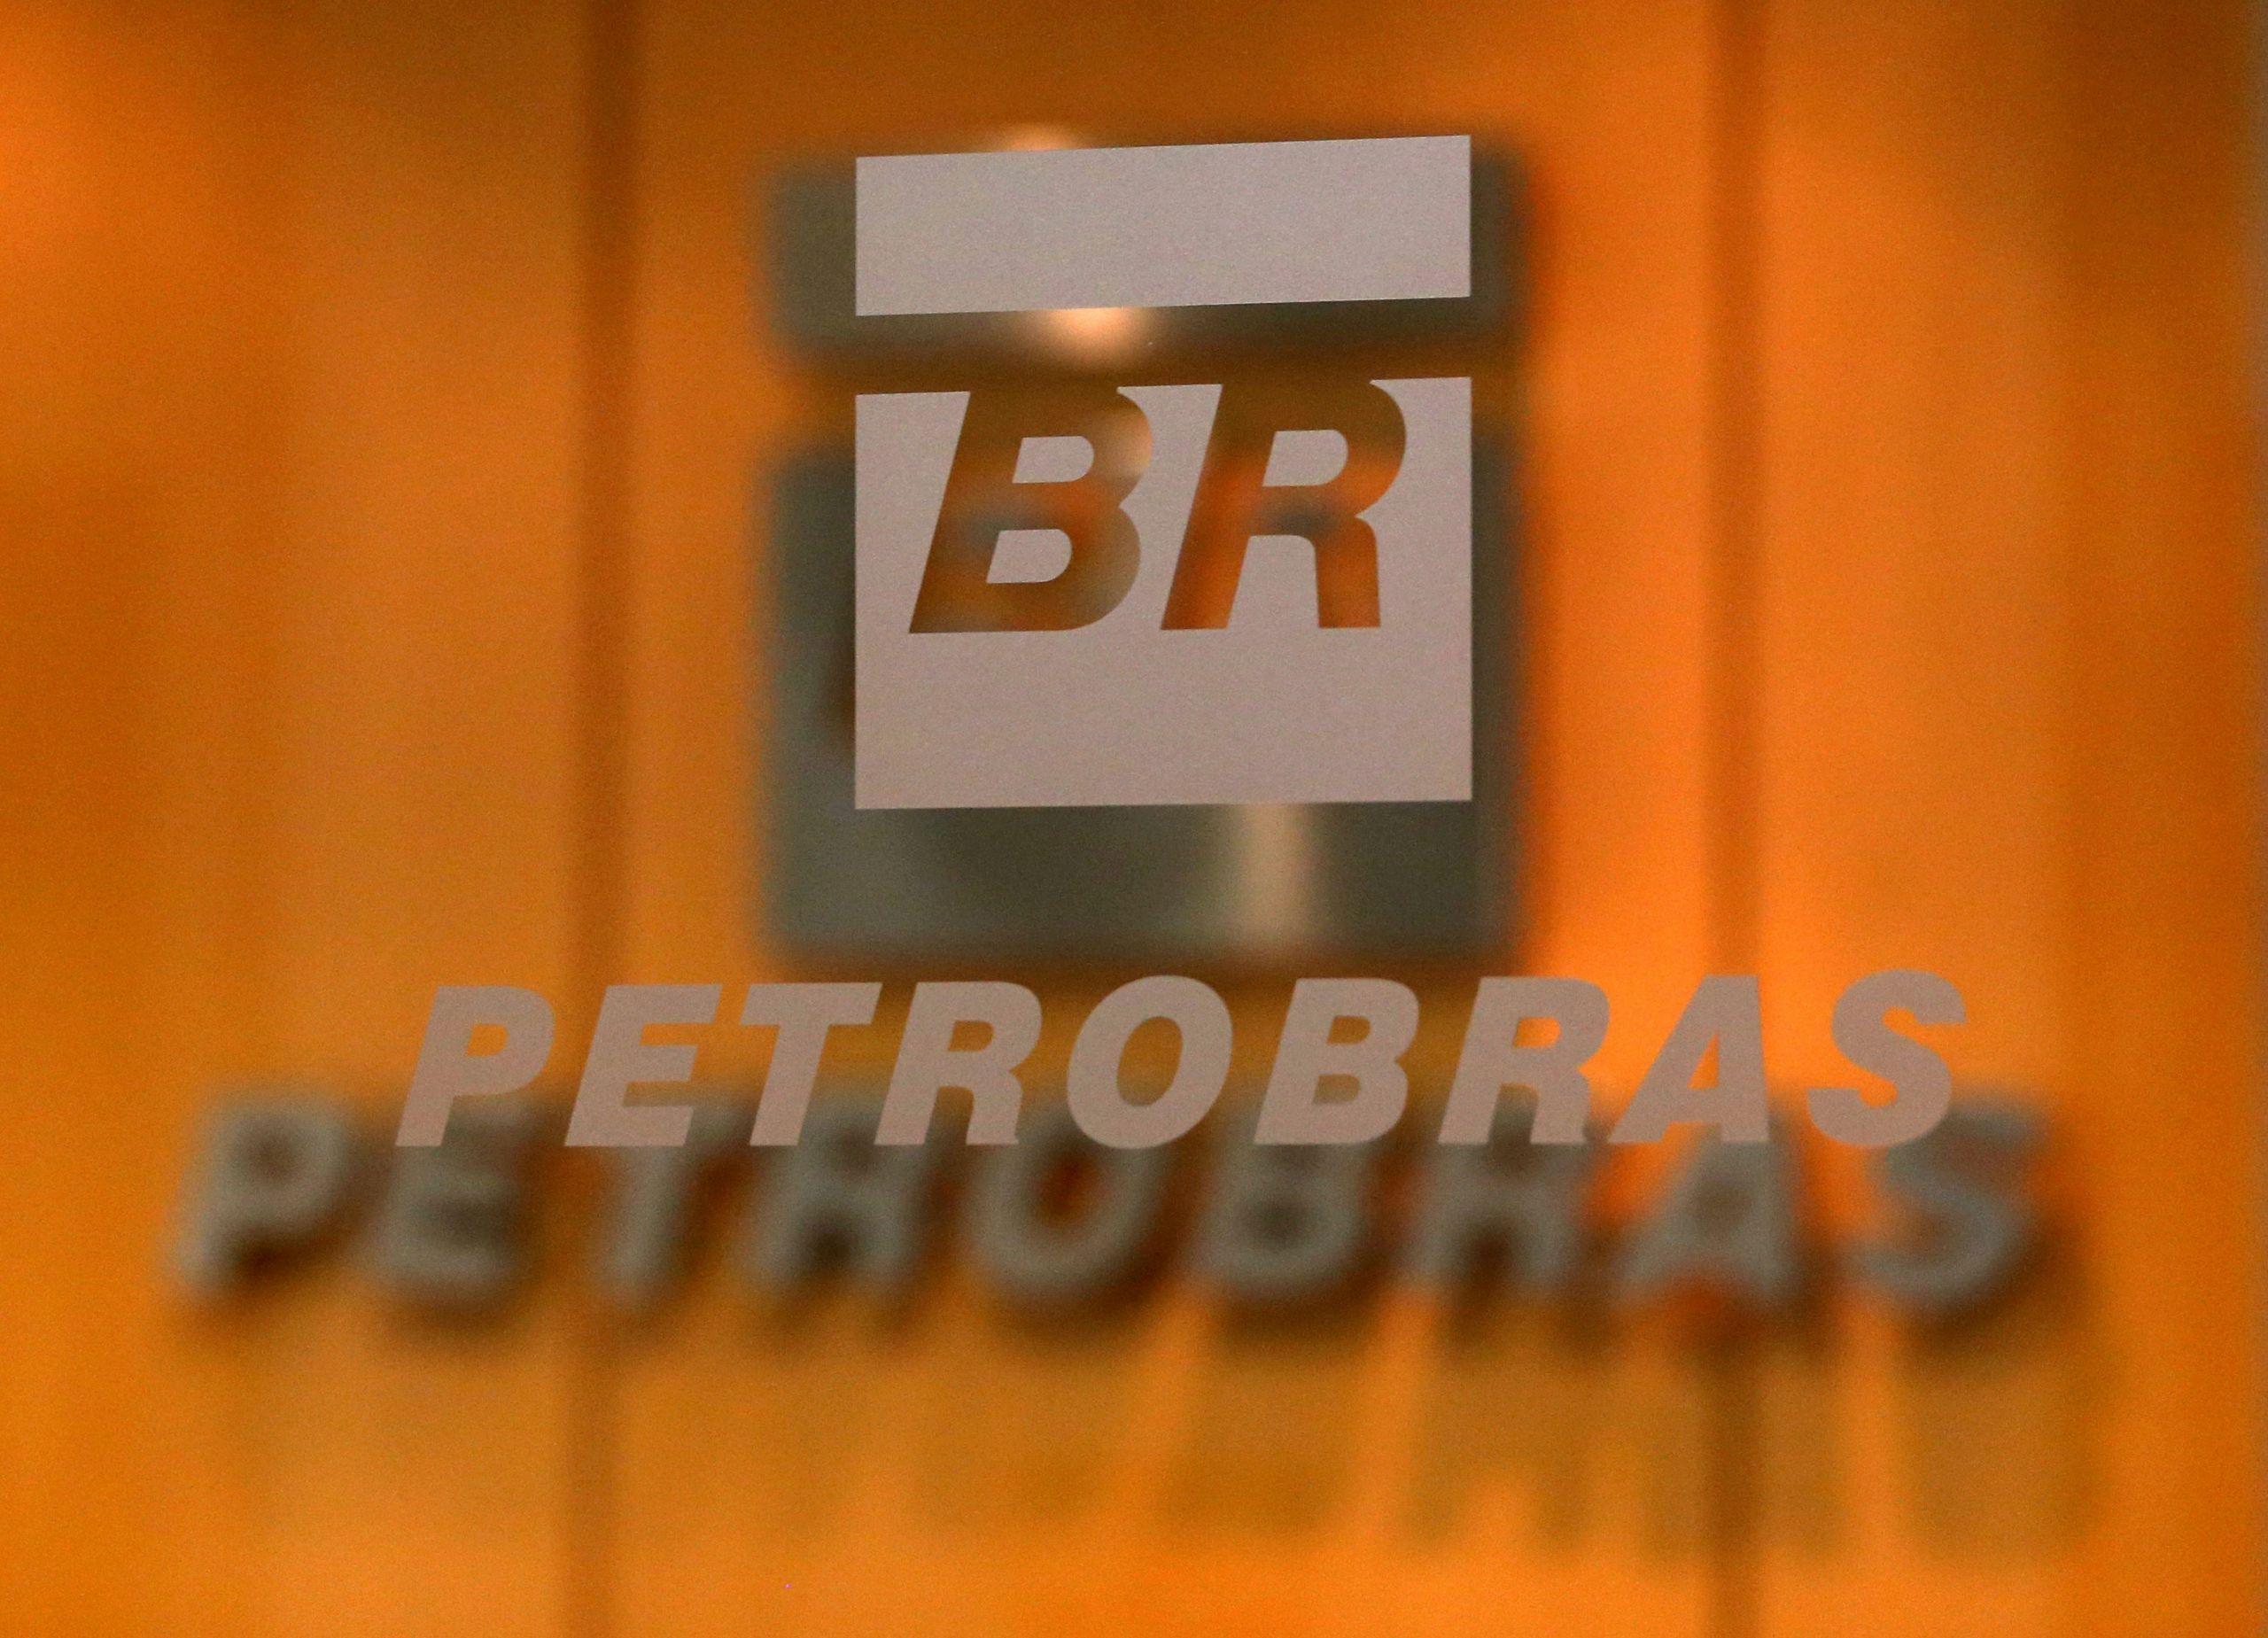 2018 10 30t z rc16b5d1e910 rtrmadp 3 petrobras divestments JPG